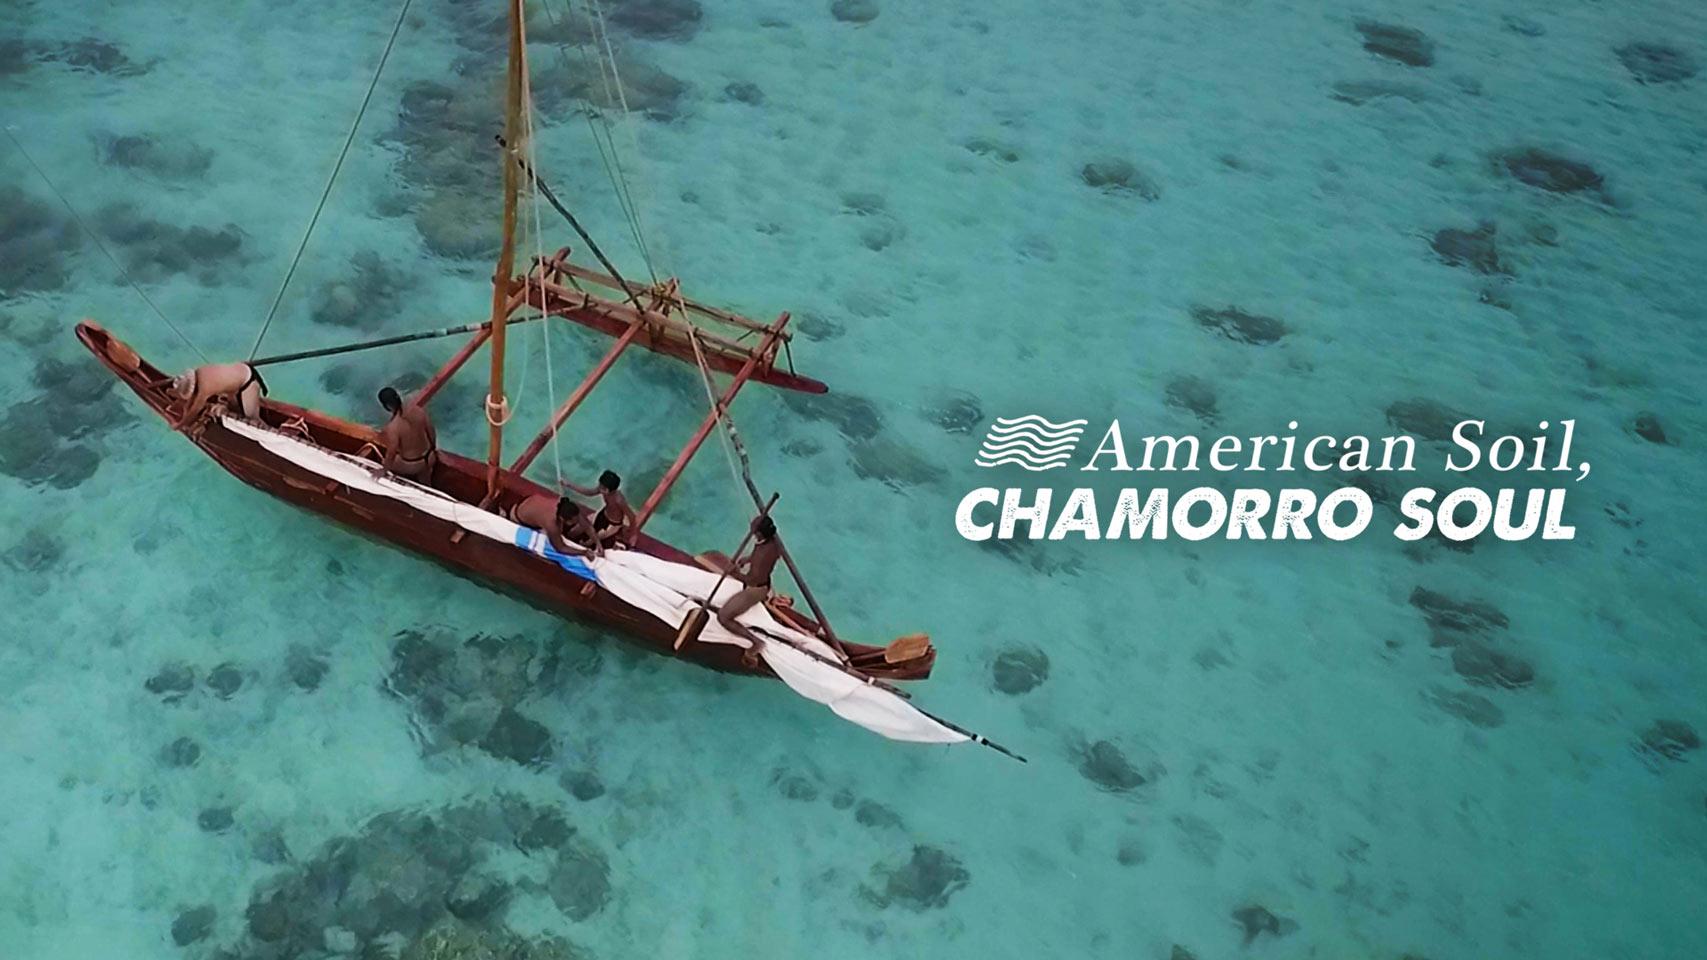 American Soil, Chamorro Soul Film, Guam